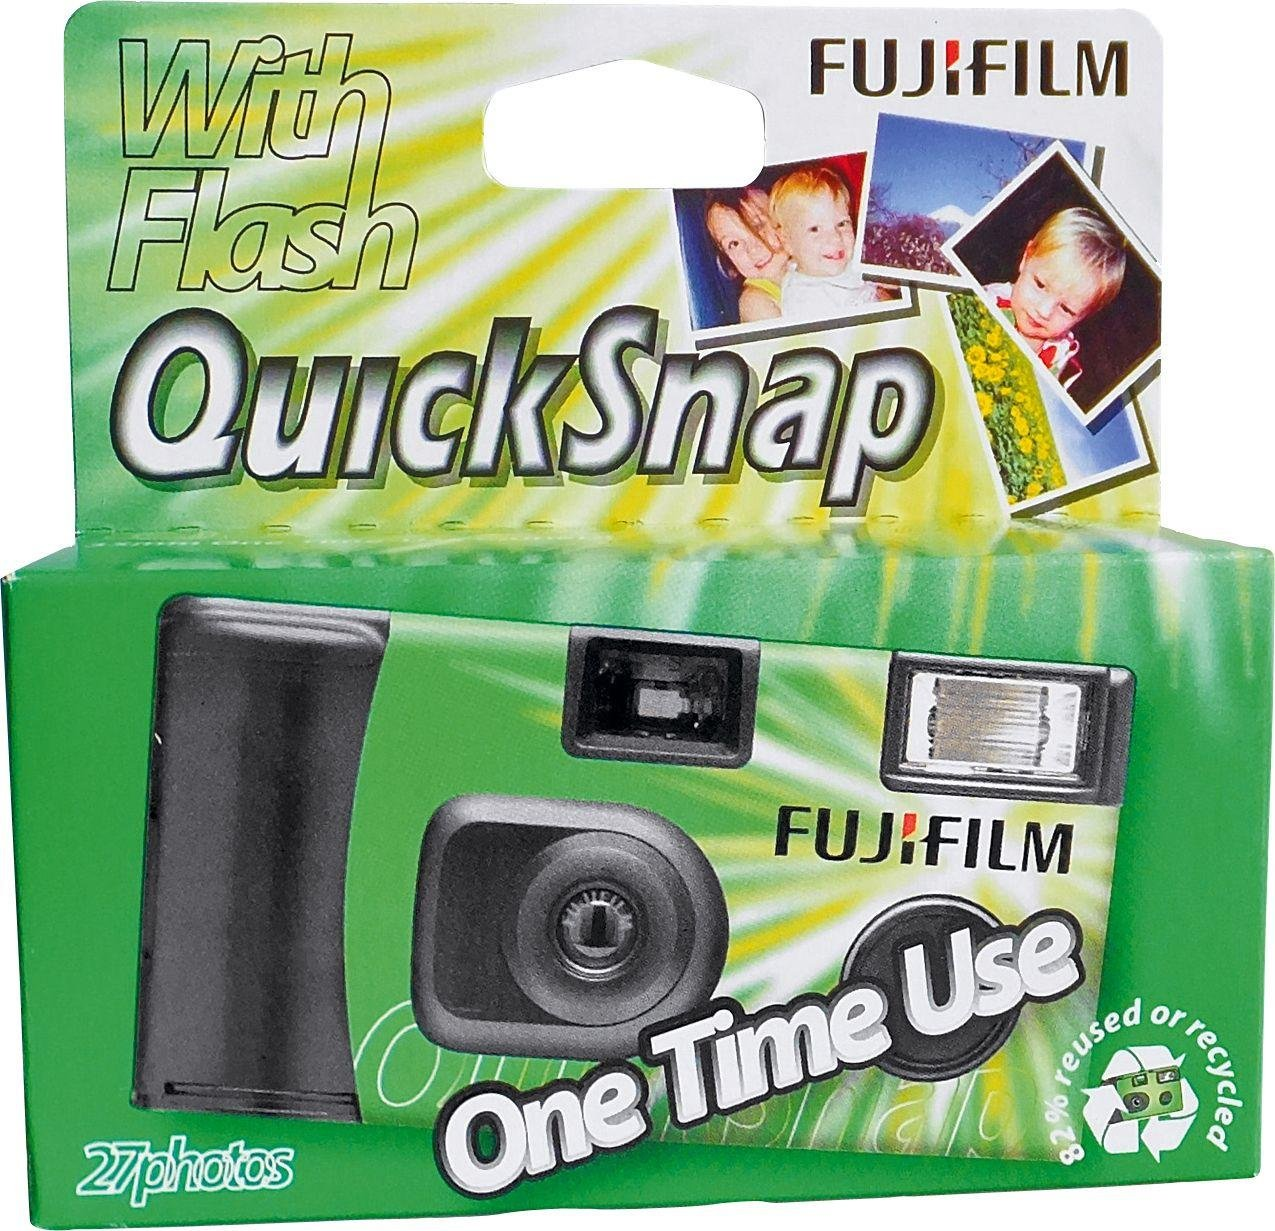 Fujifilm Single Use Camera - 27 Shots with Flash